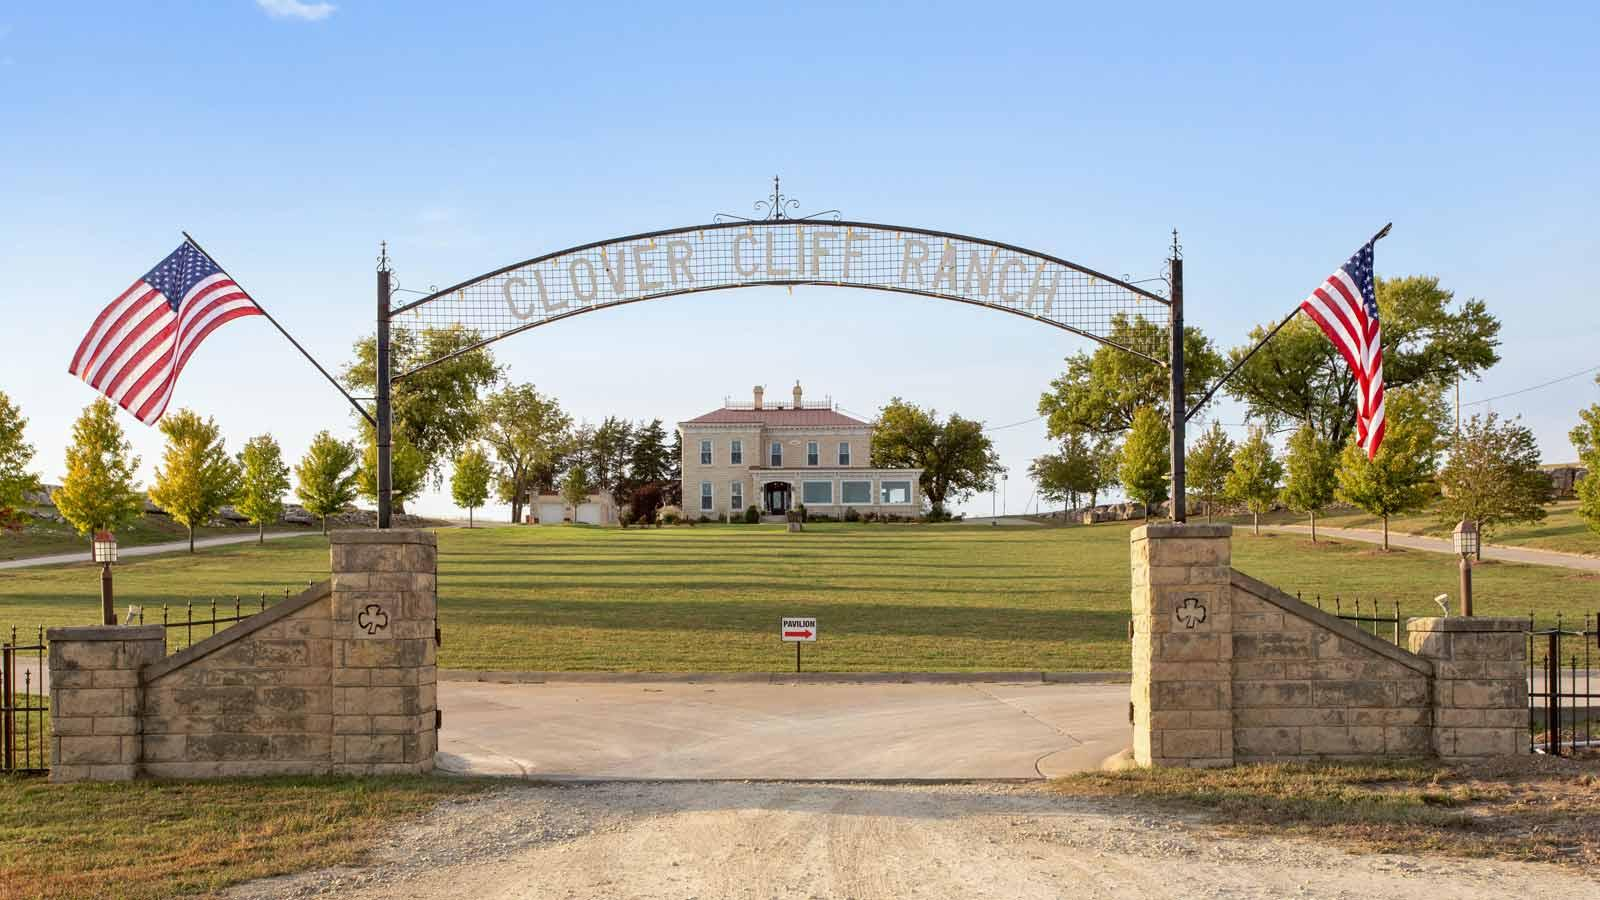 Entrance to Clover Cliff Ranch